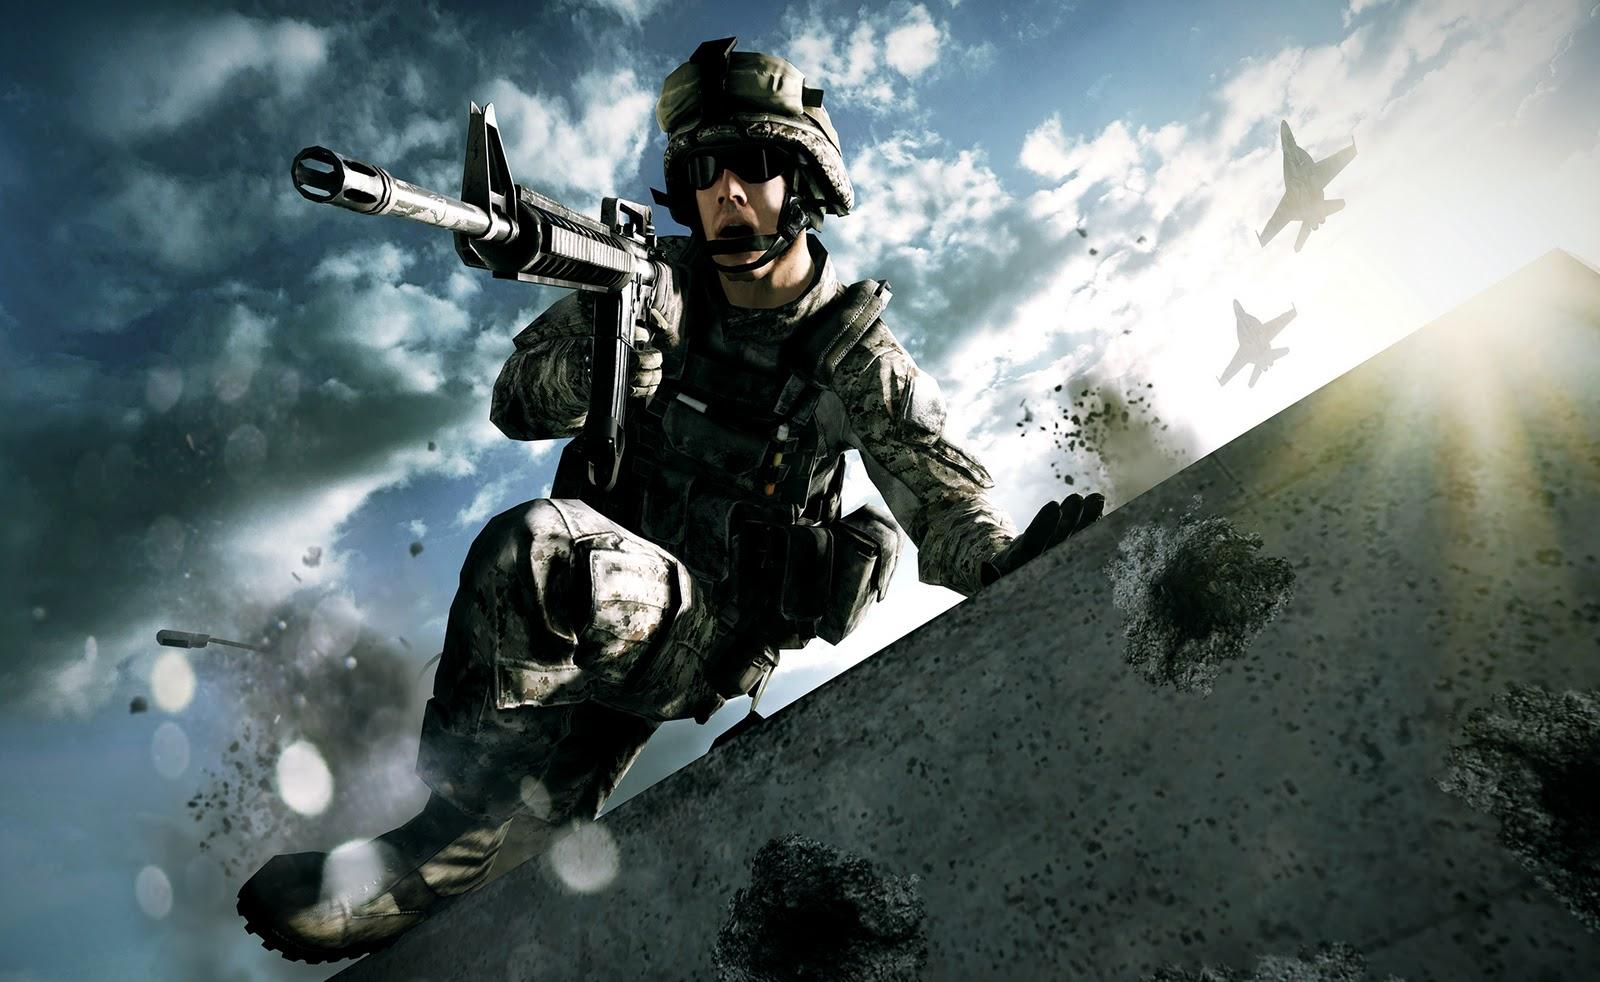 http://3.bp.blogspot.com/-aTsfr0JOJpo/TosAGvFCJmI/AAAAAAAABJU/Xrp_2fgEV1I/s1600/Battlefield3-CaspianBorder-Leap.jpg